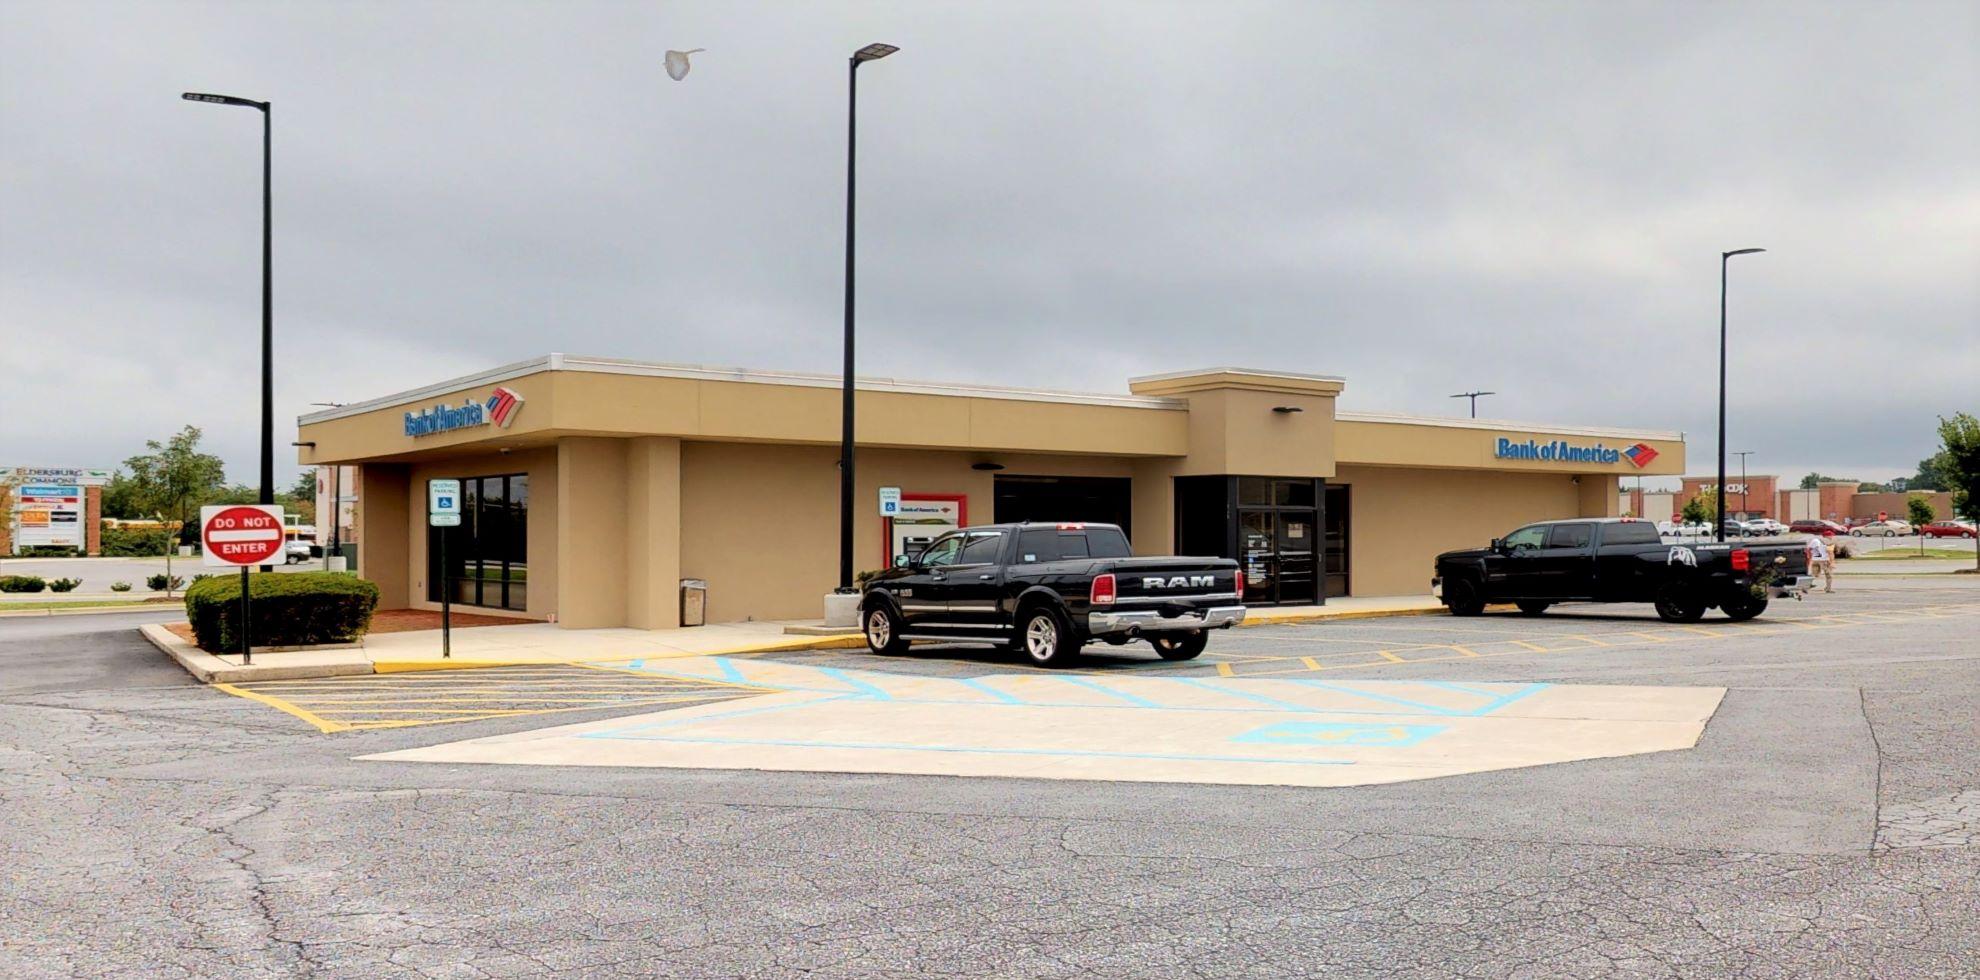 Bank of America financial center with drive-thru ATM | 6400 Ridge Rd, Eldersburg, MD 21784